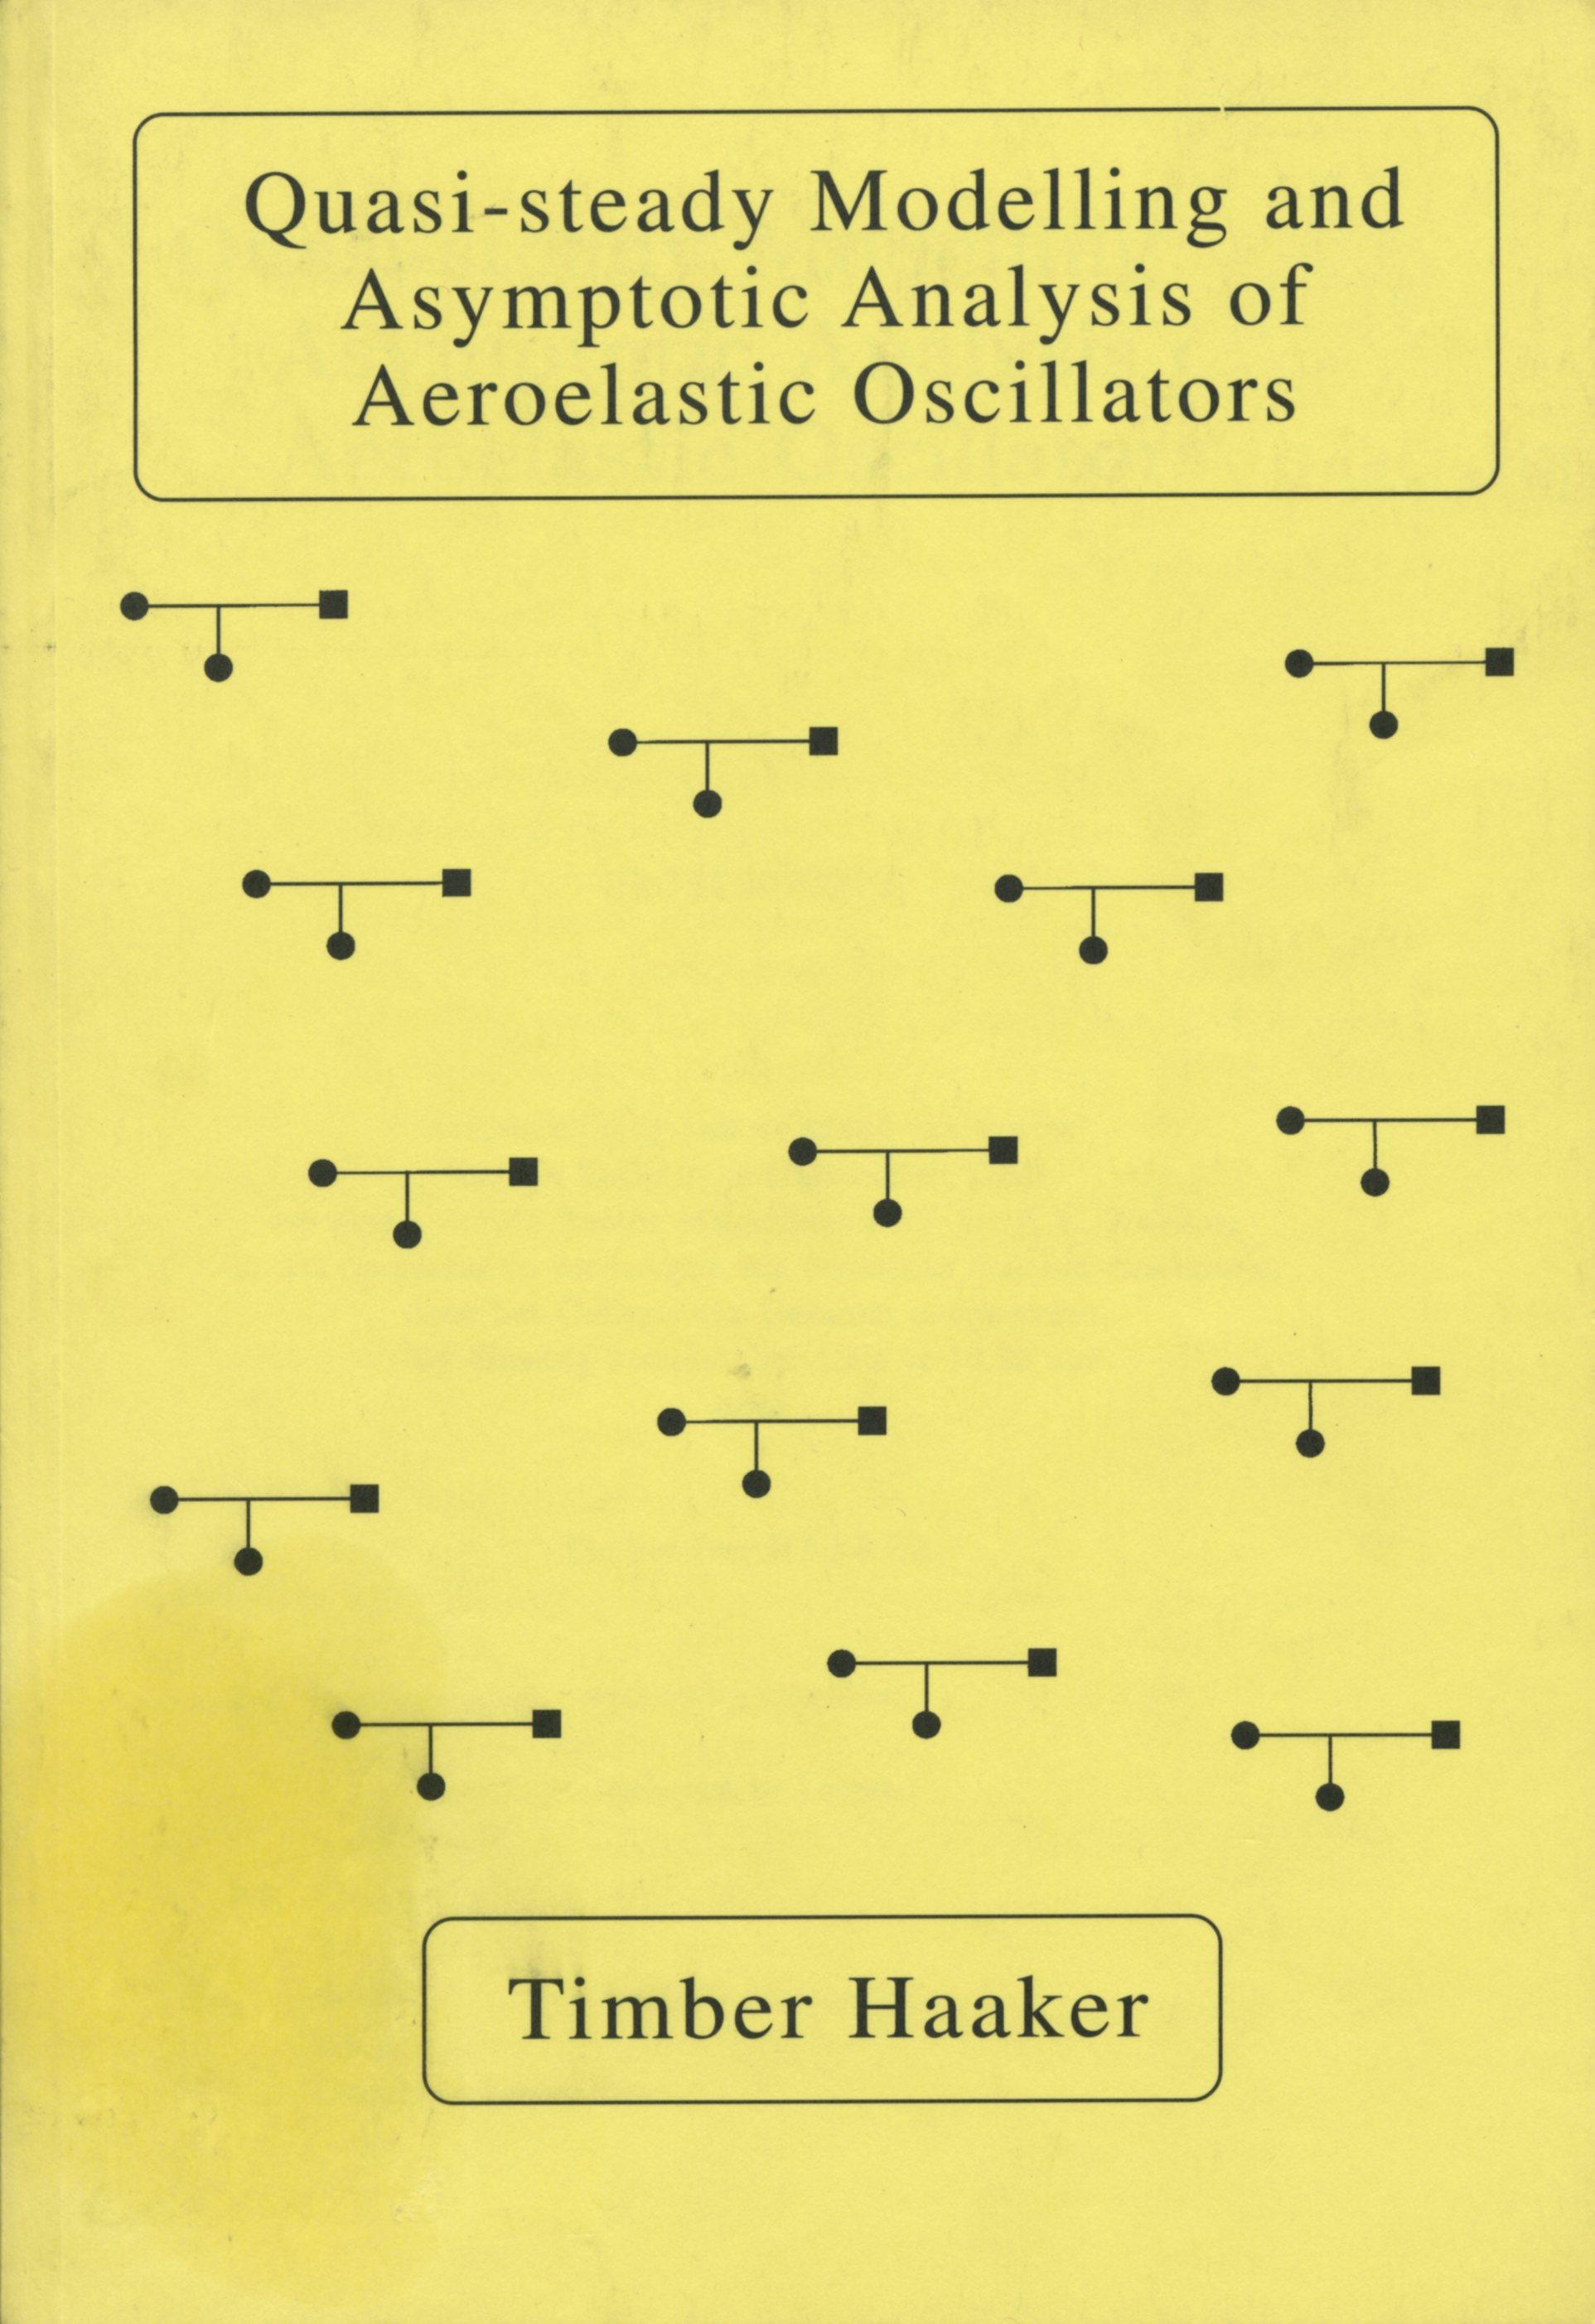 Quasi-Steady Modelling and Asymptotic Analysis of Aeroelastic Oscillators